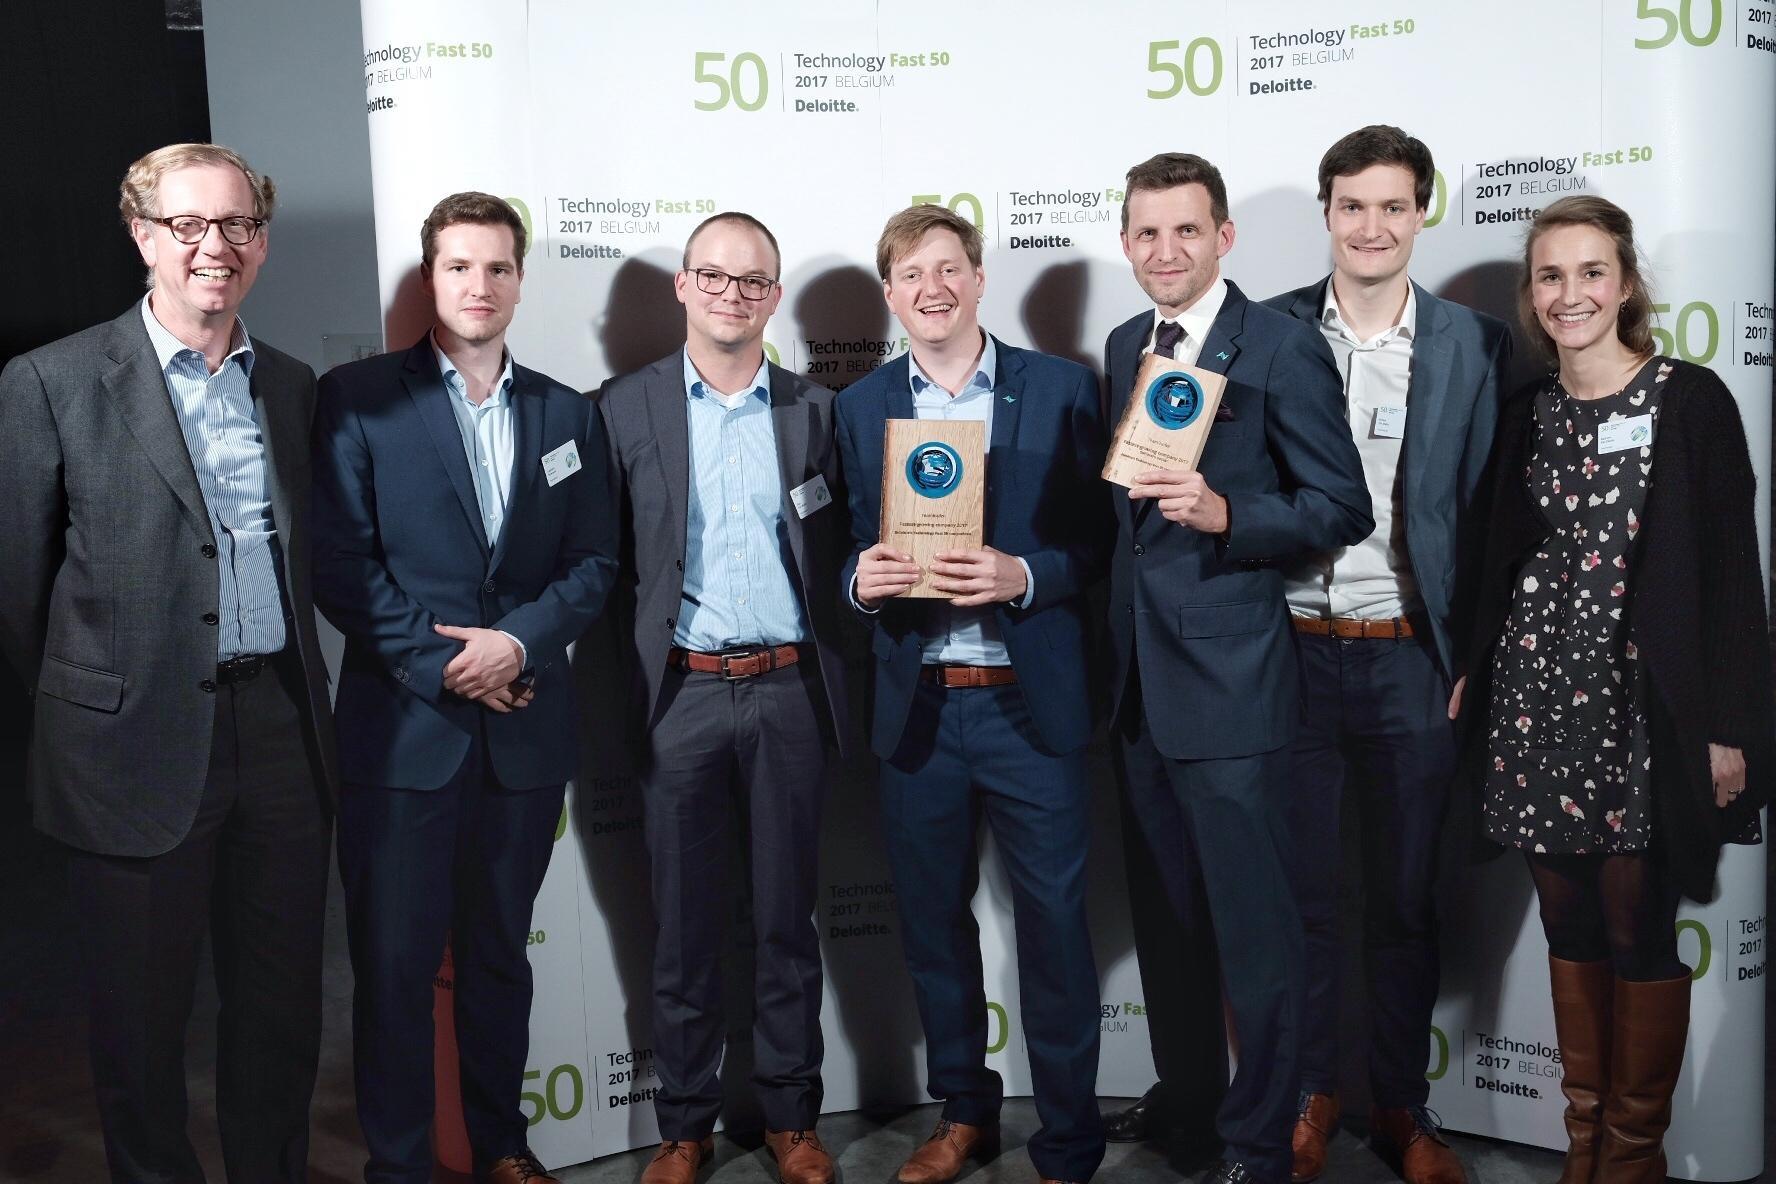 Deloitte's Technology Fast 50, Teamleader al primo posto